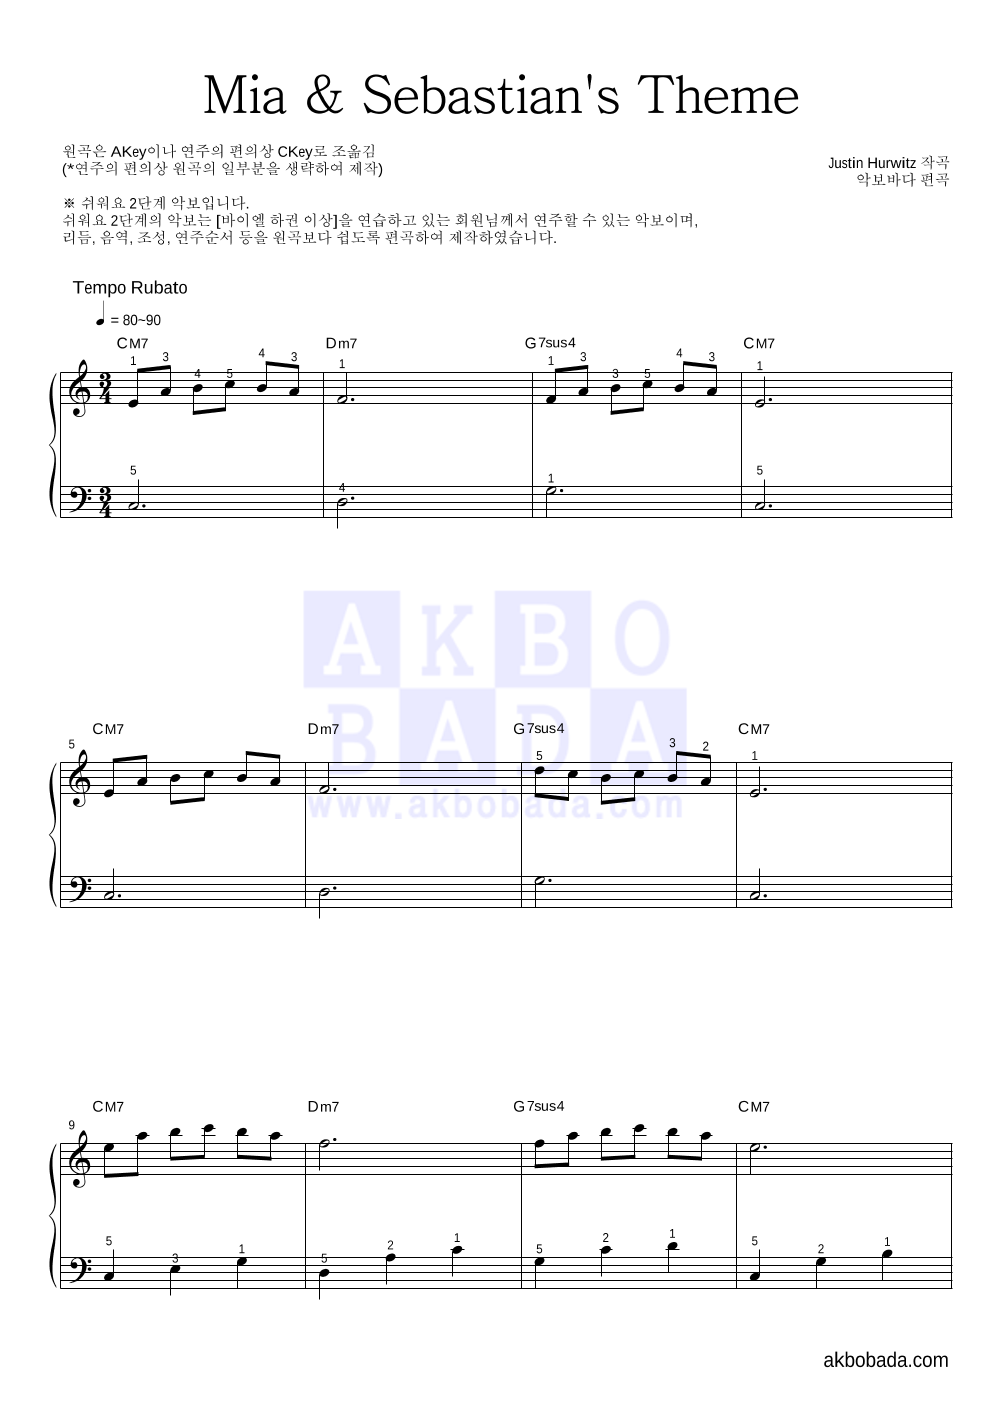 Justin Hurwitz - Mia & Sebastian's Theme 피아노2단-쉬워요 악보